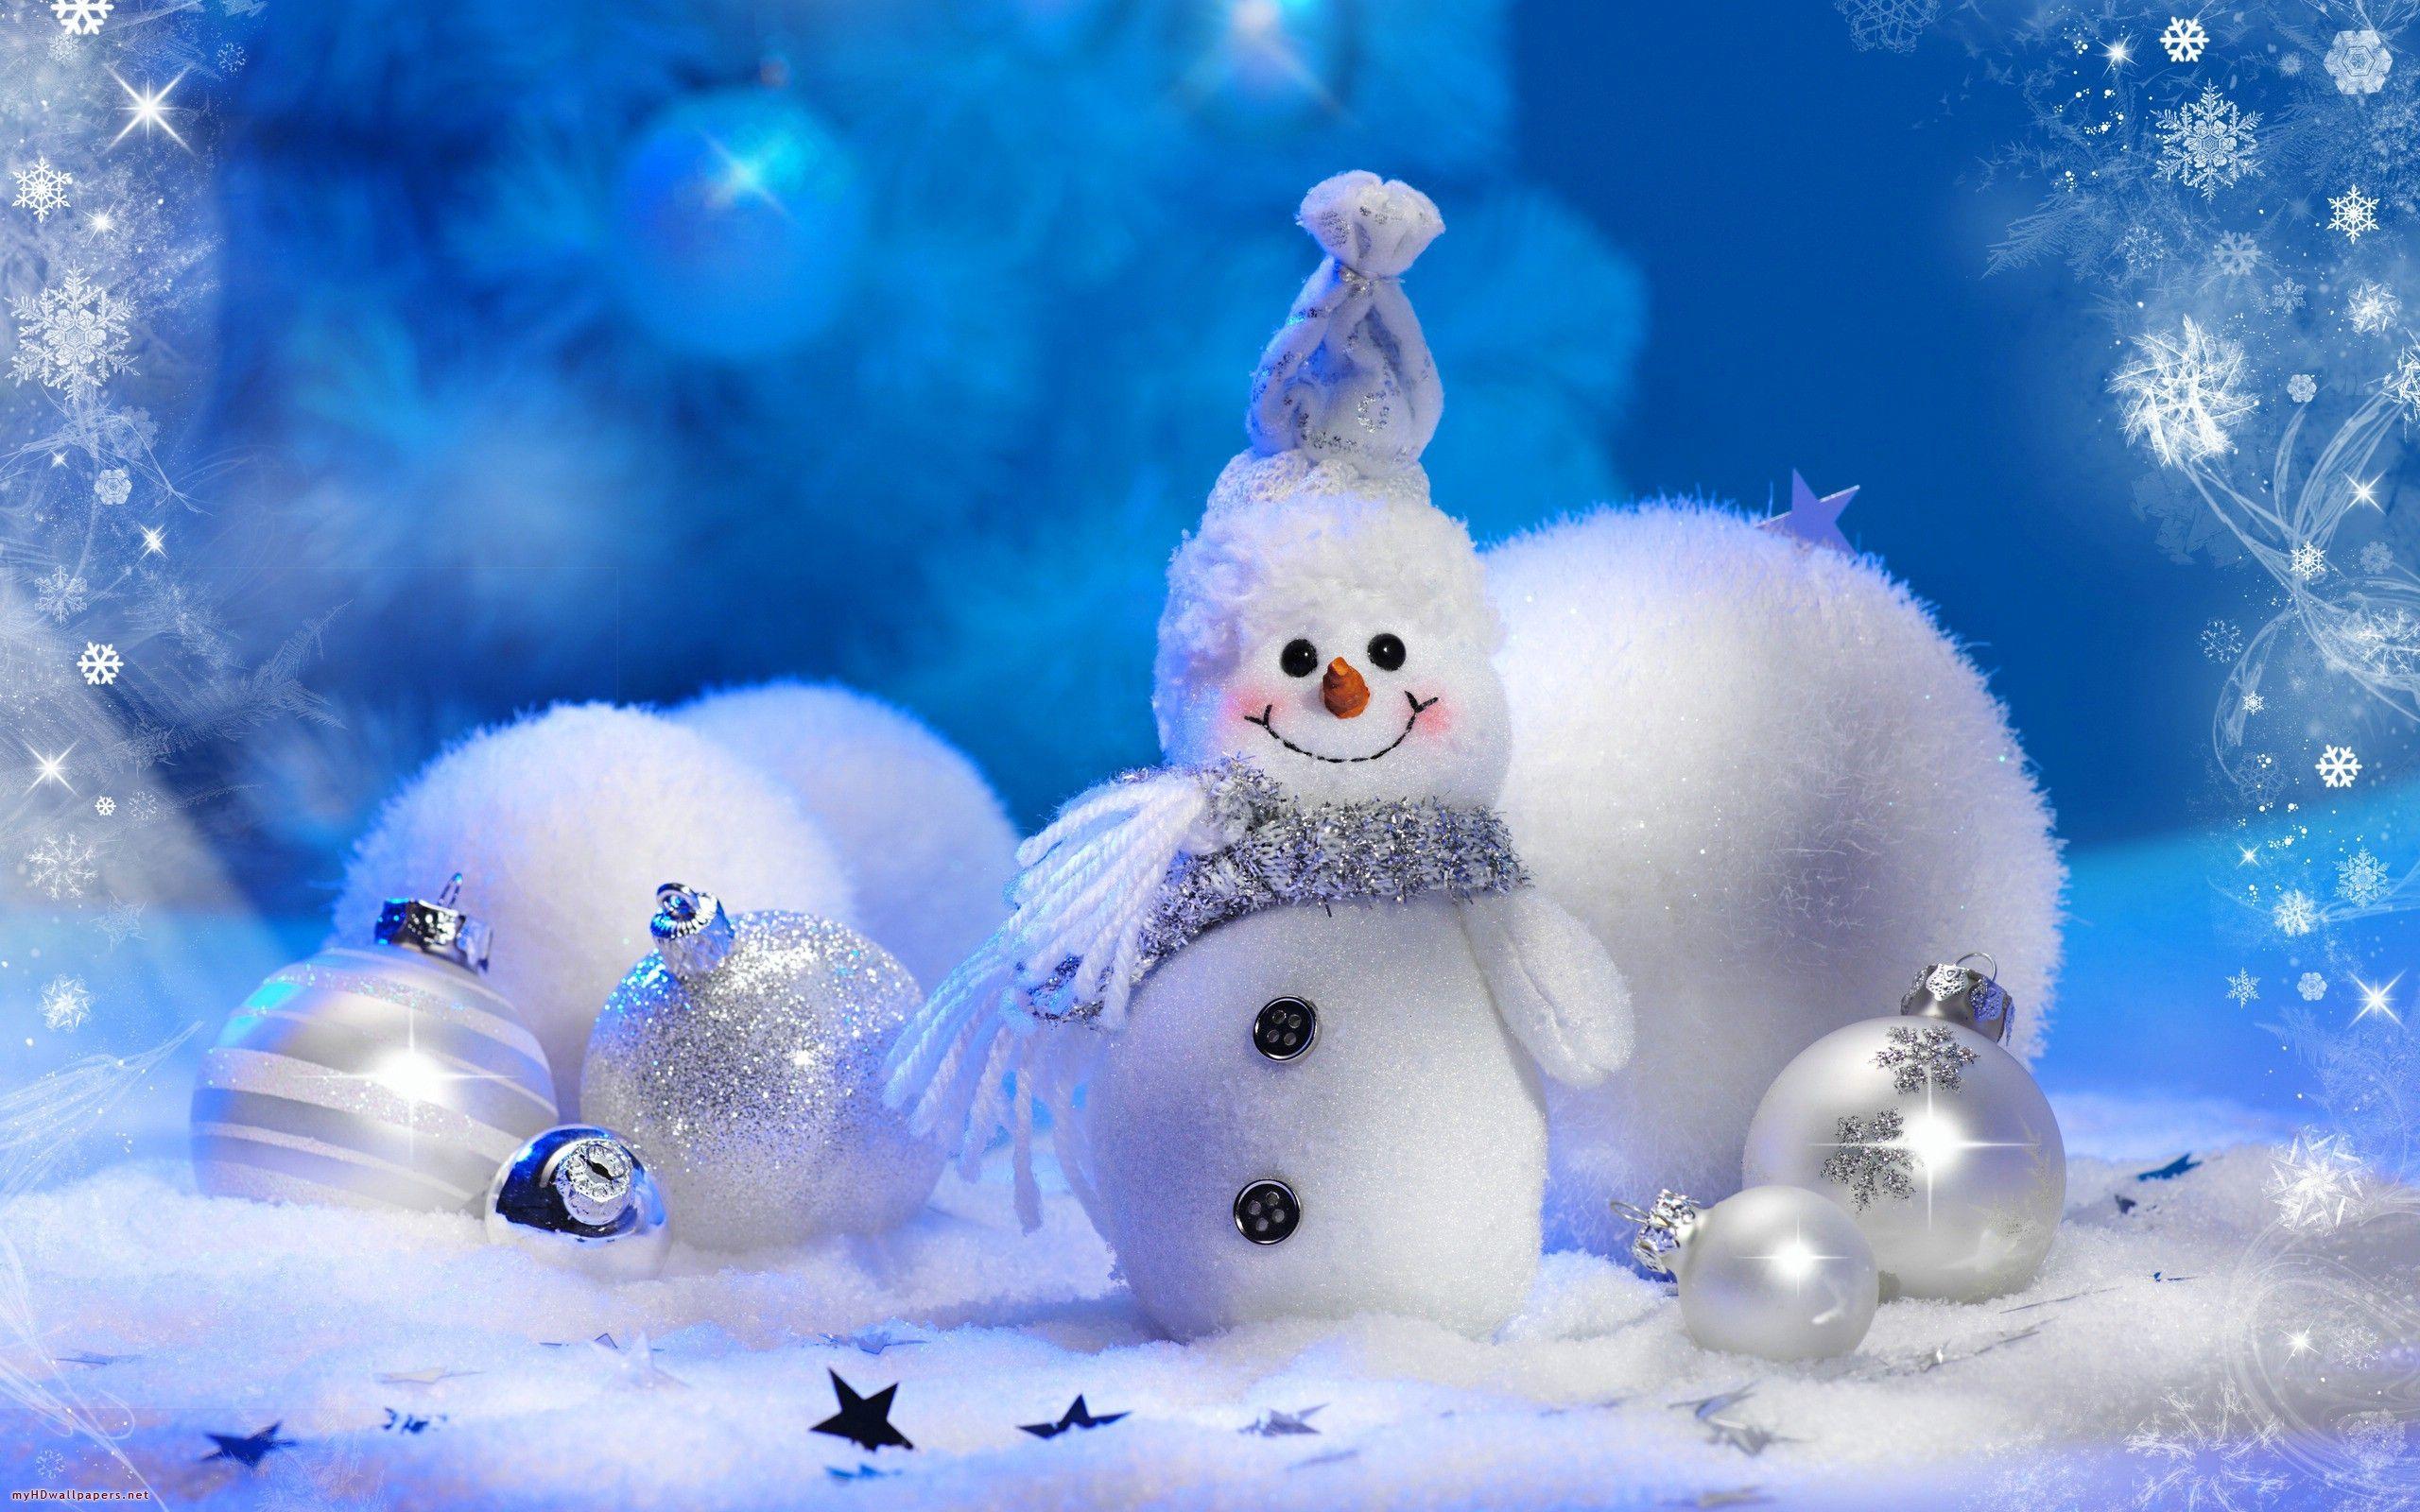 40 free animated christmas wallpaper for desktop